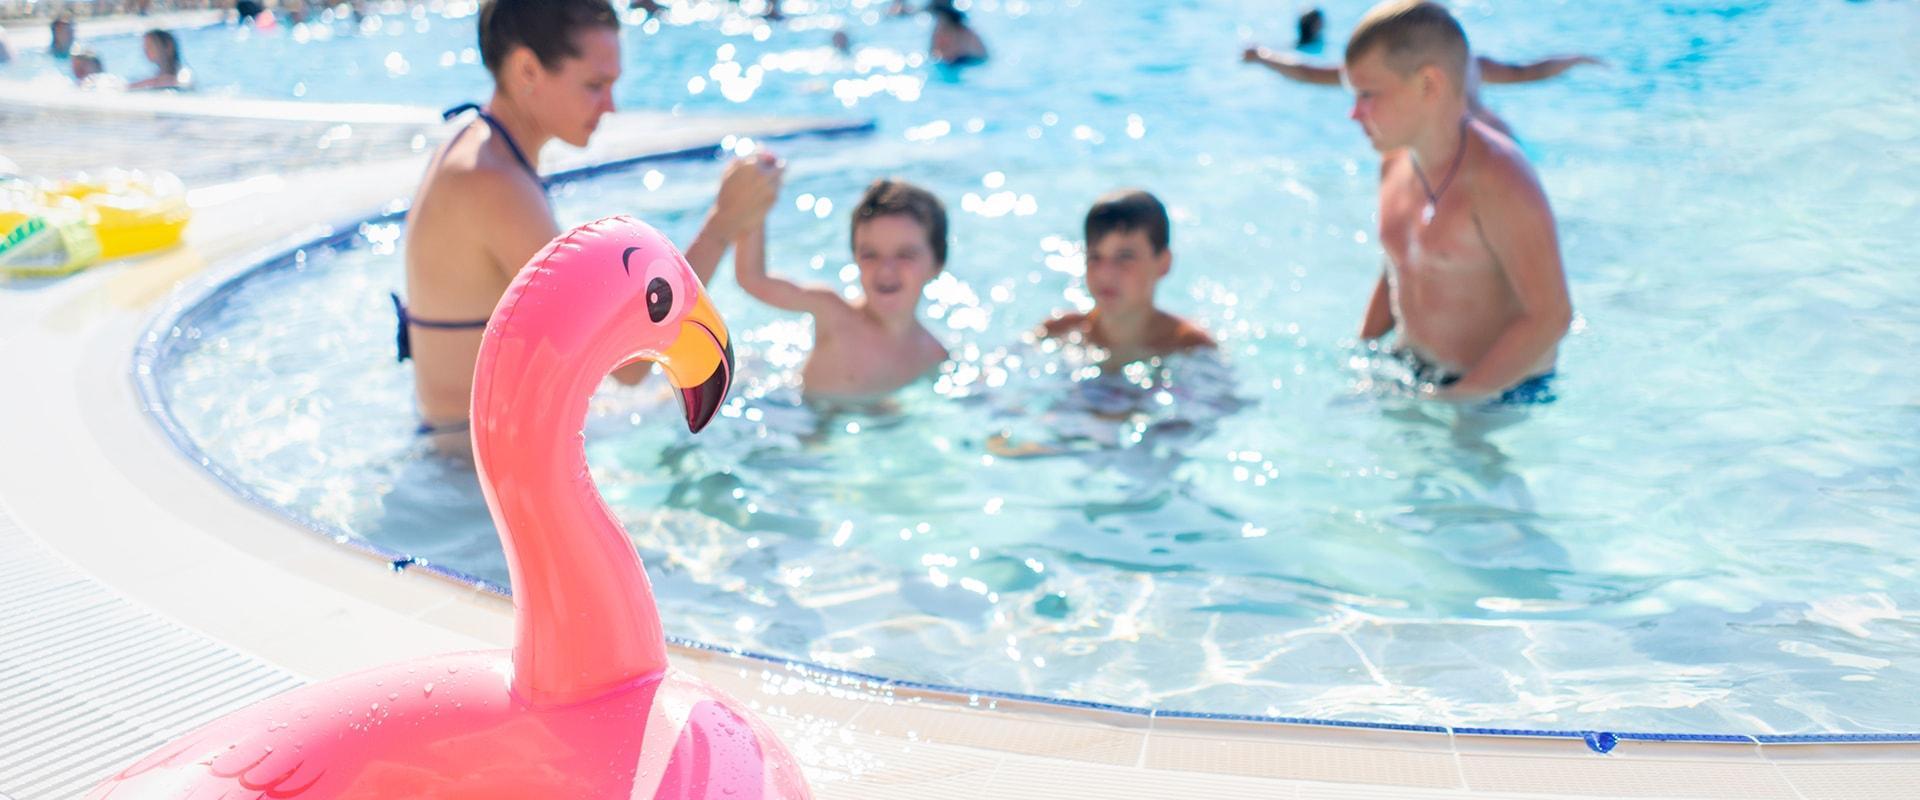 2020-05-11-artepool-sicurezza-piscina-02